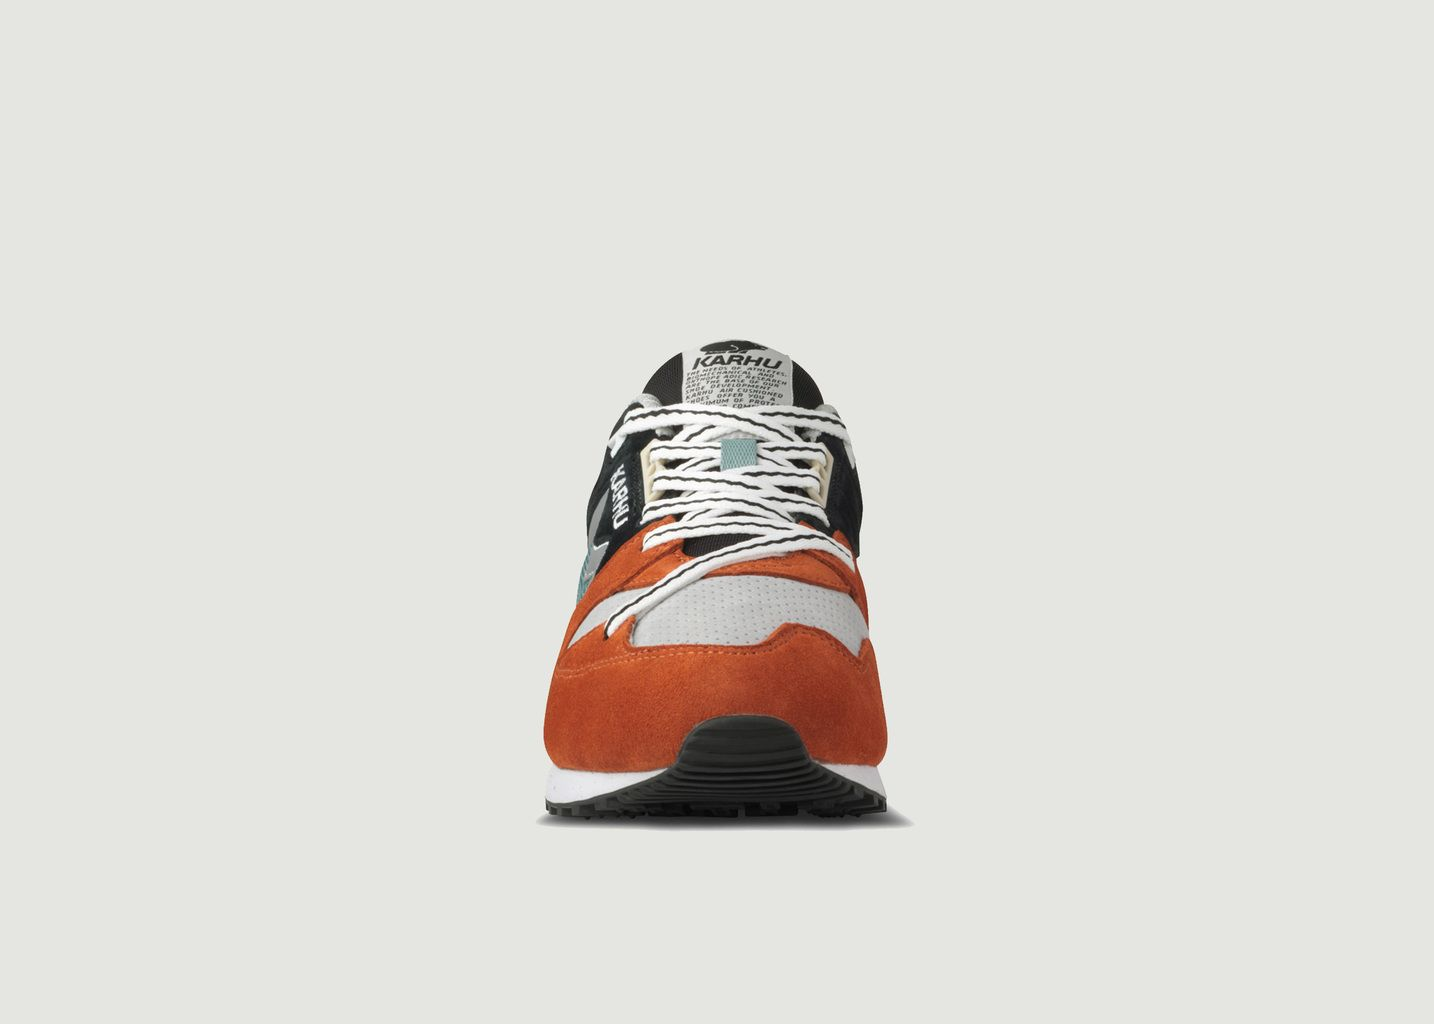 Sneakers de running en cuir suédé et mesh Synchron Classic - Karhu